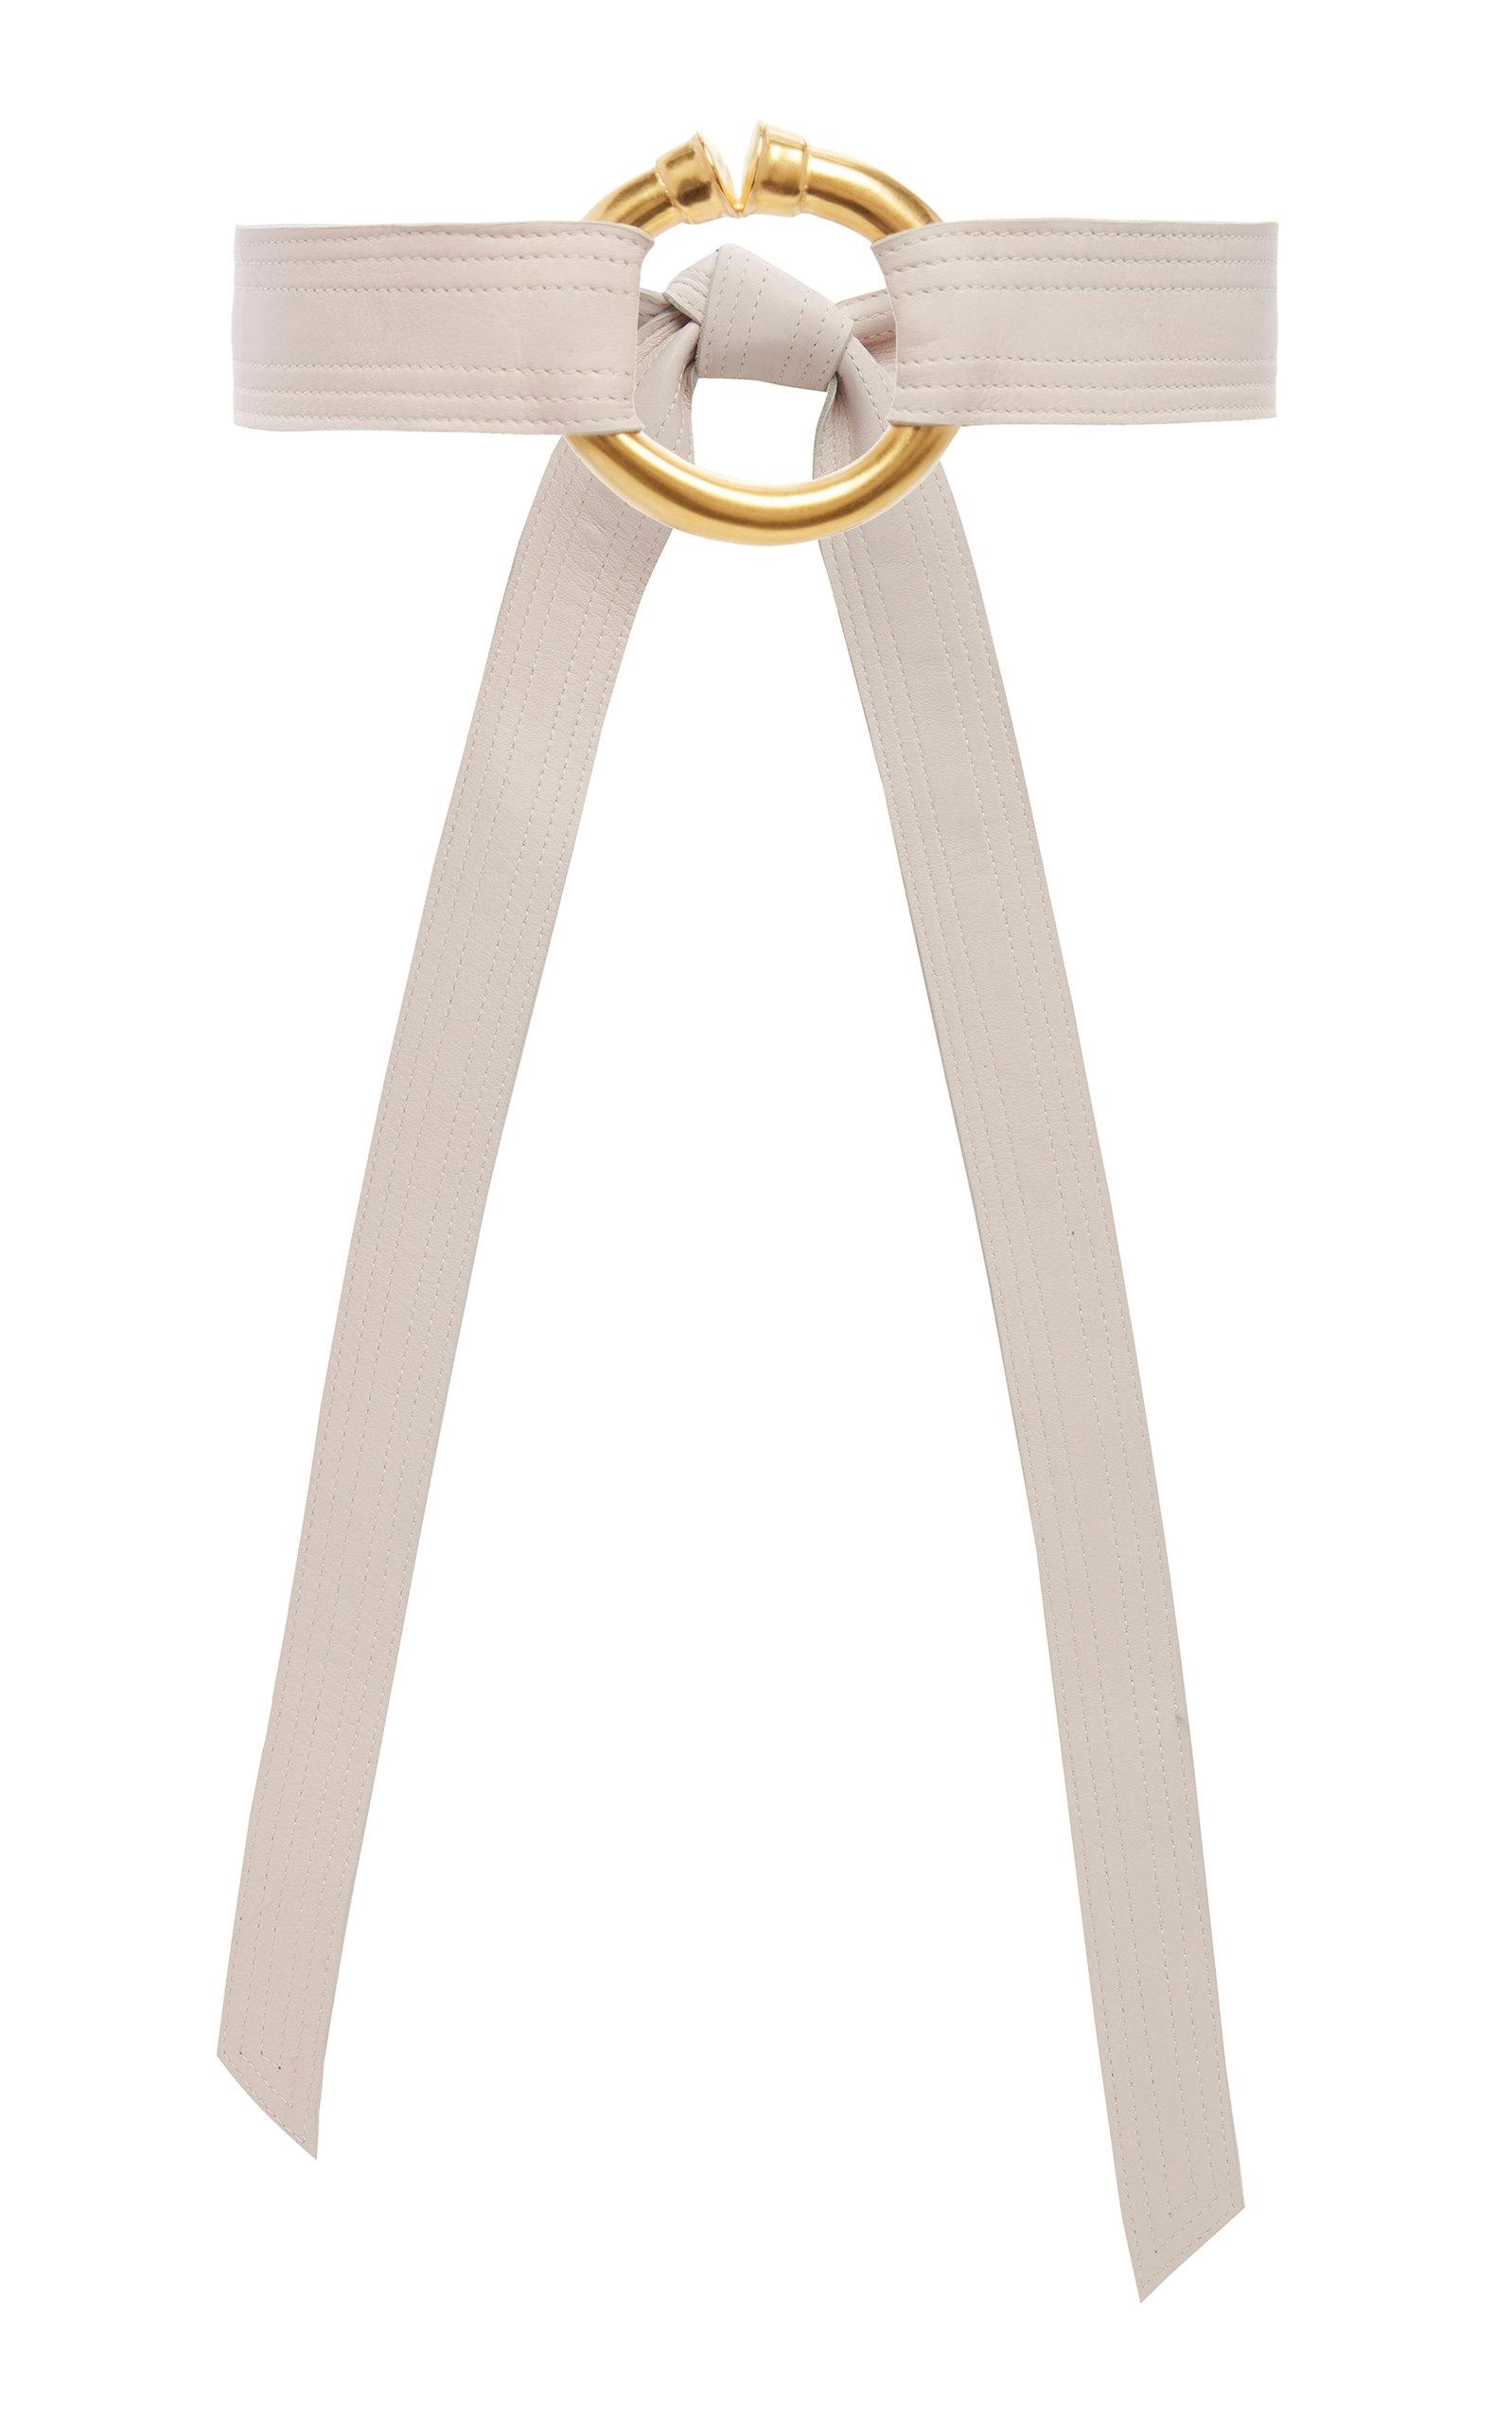 JOHANNA ORTIZ | Johanna Ortiz My Dream Painting Gold-Tone Leather Waist Belt | Goxip